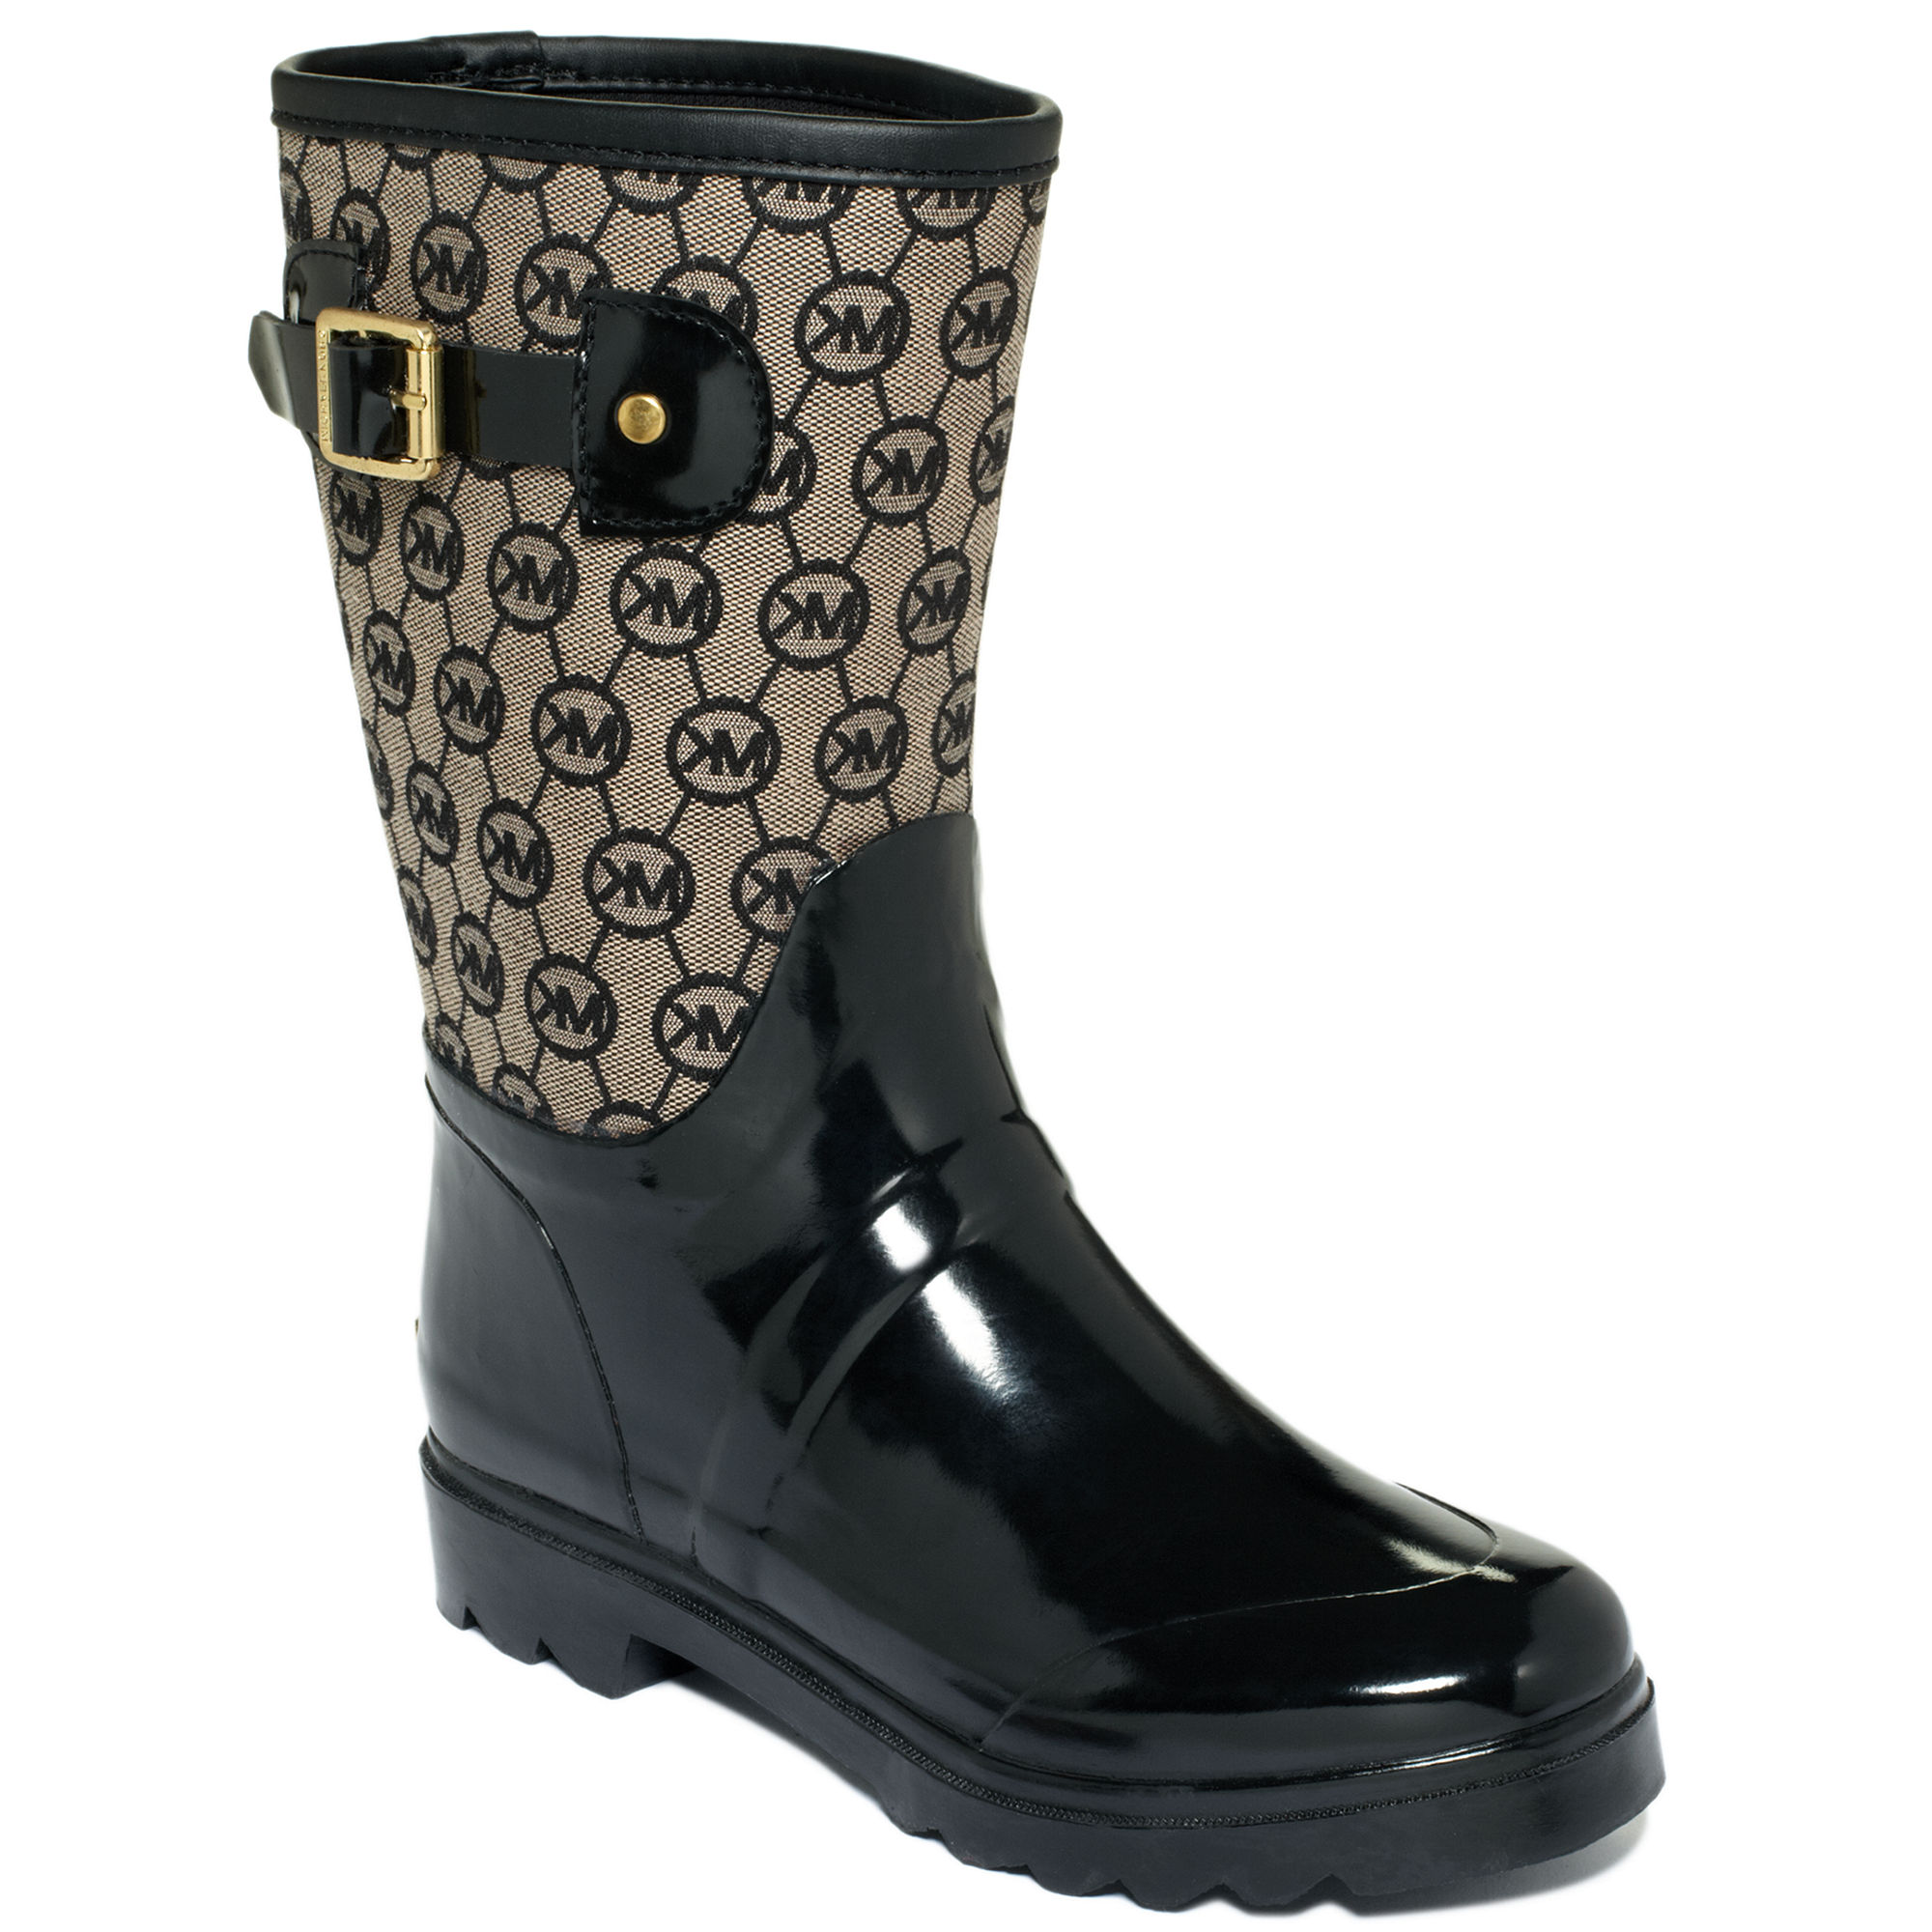 Michael kors Monogram Mid Rain Boots in Black | Lyst